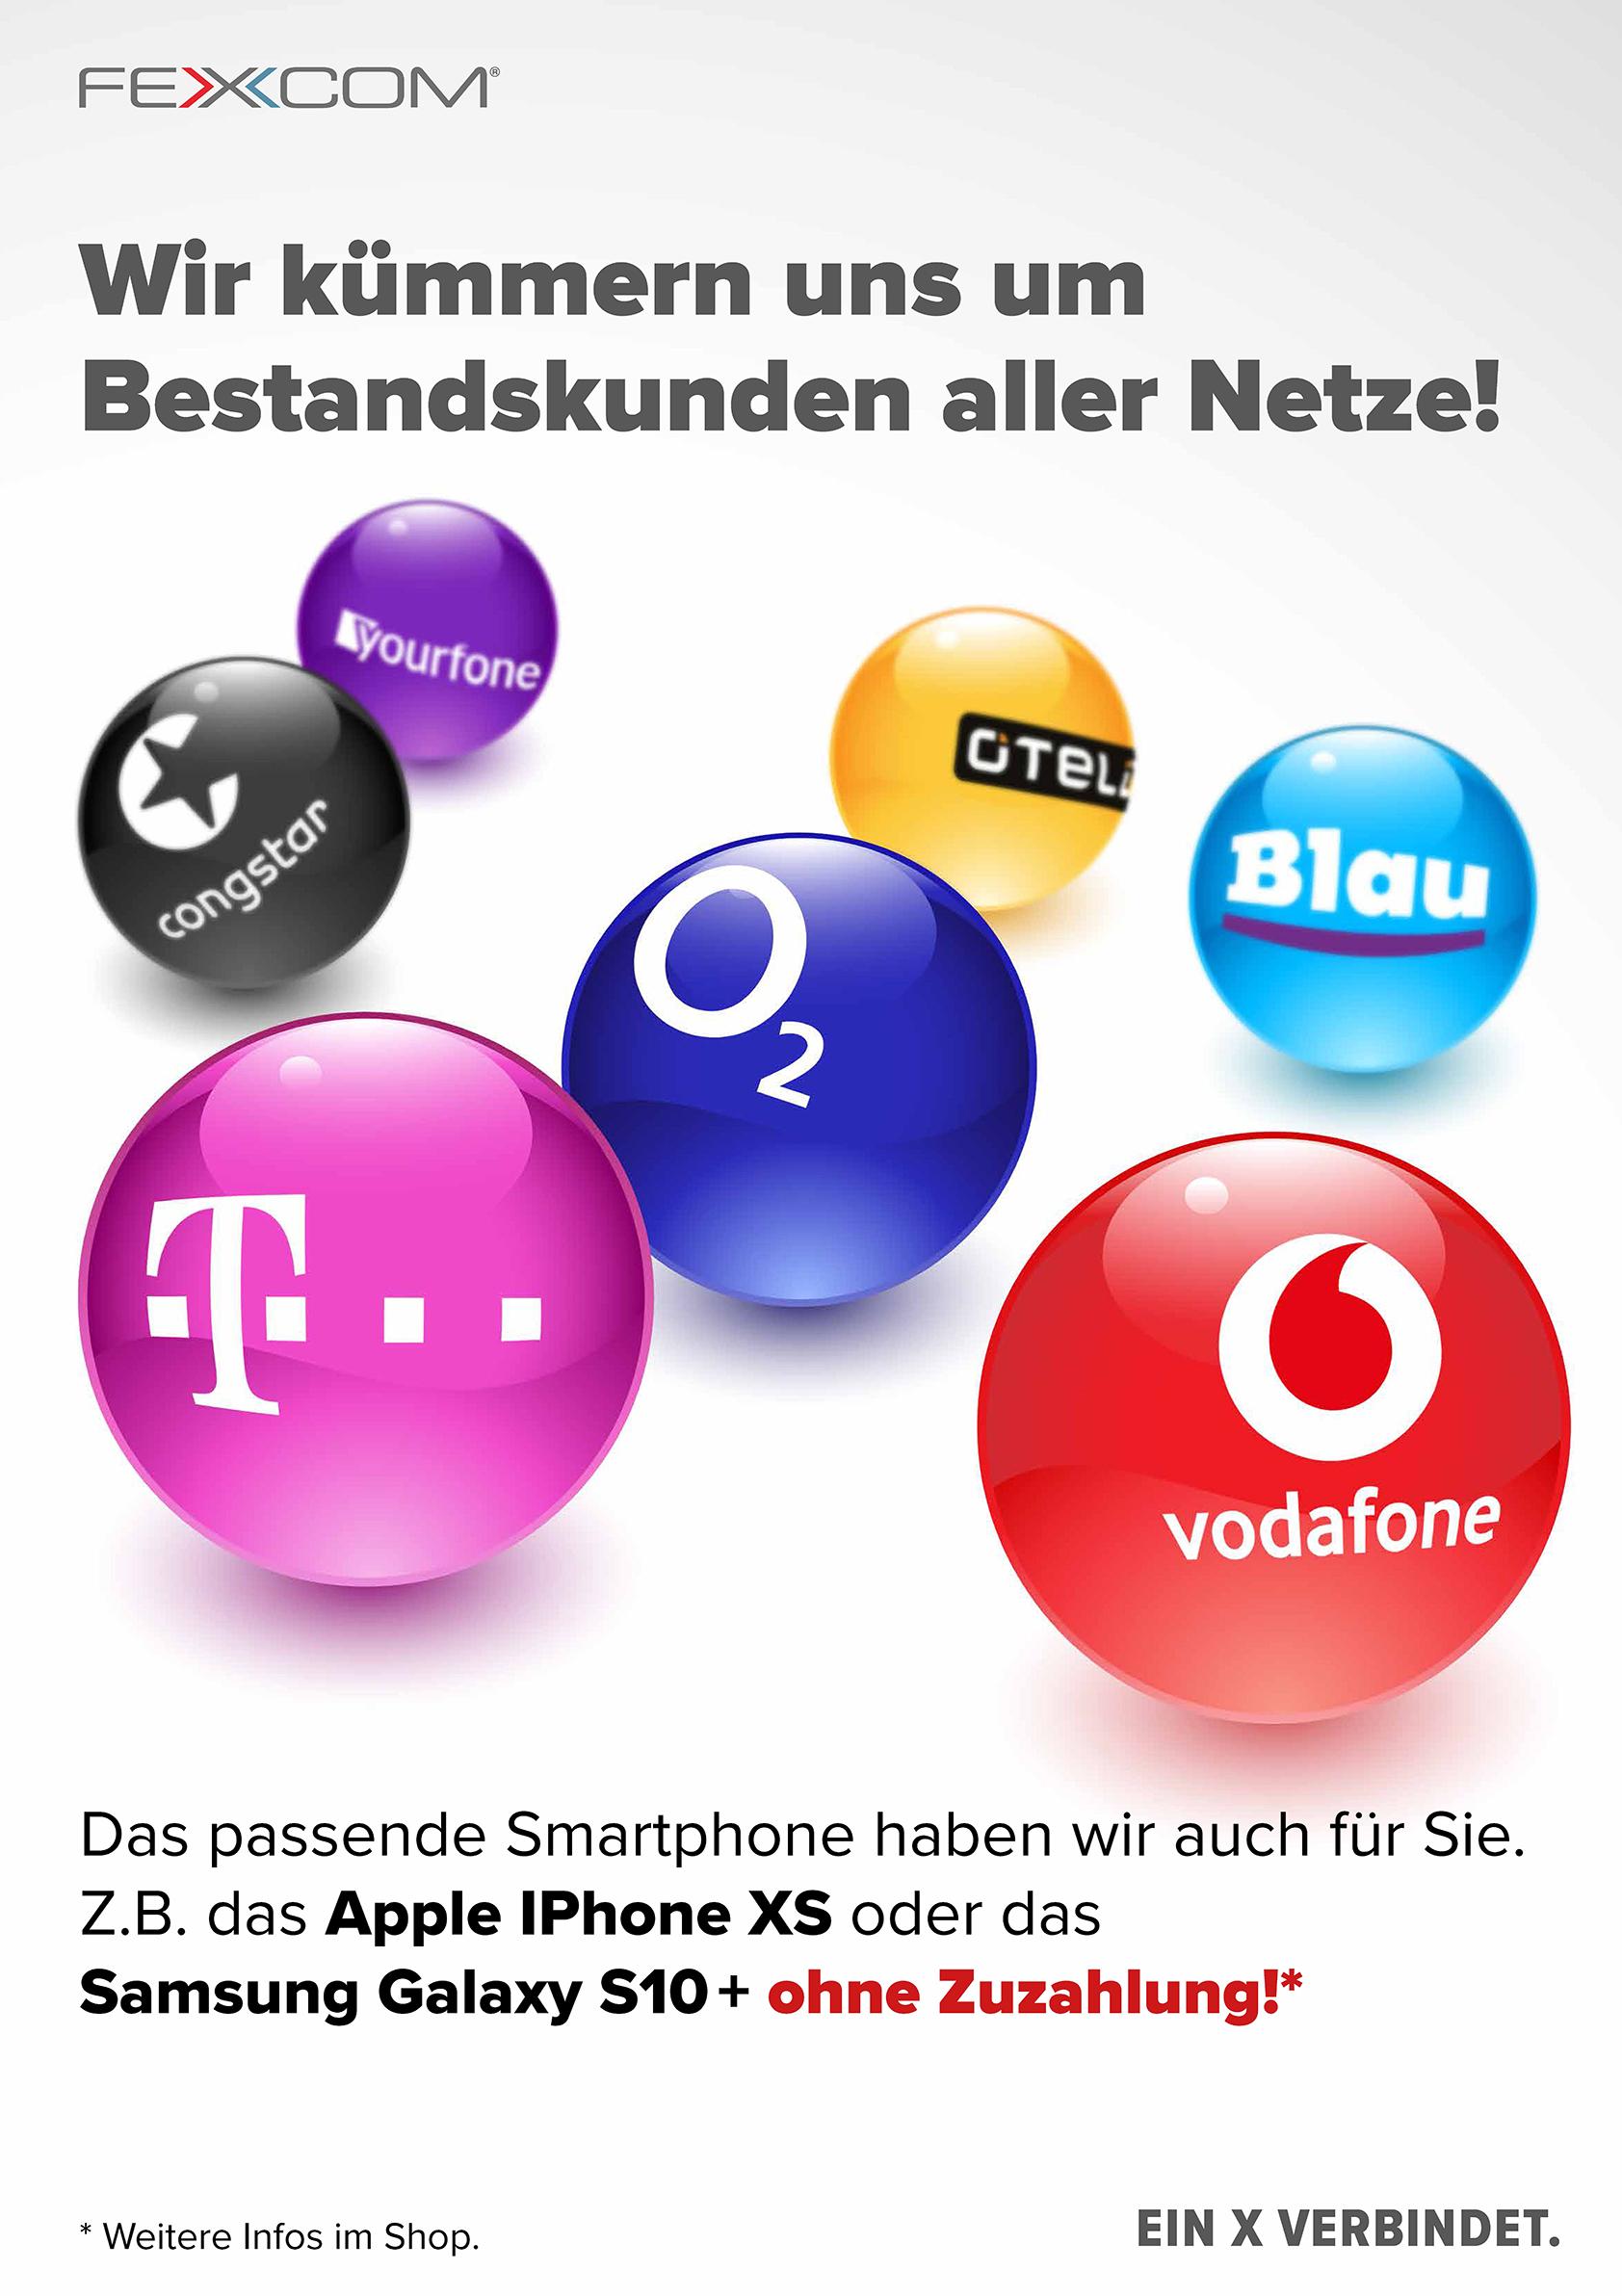 Mobilfunkshop FEXCOM Bad Homburg